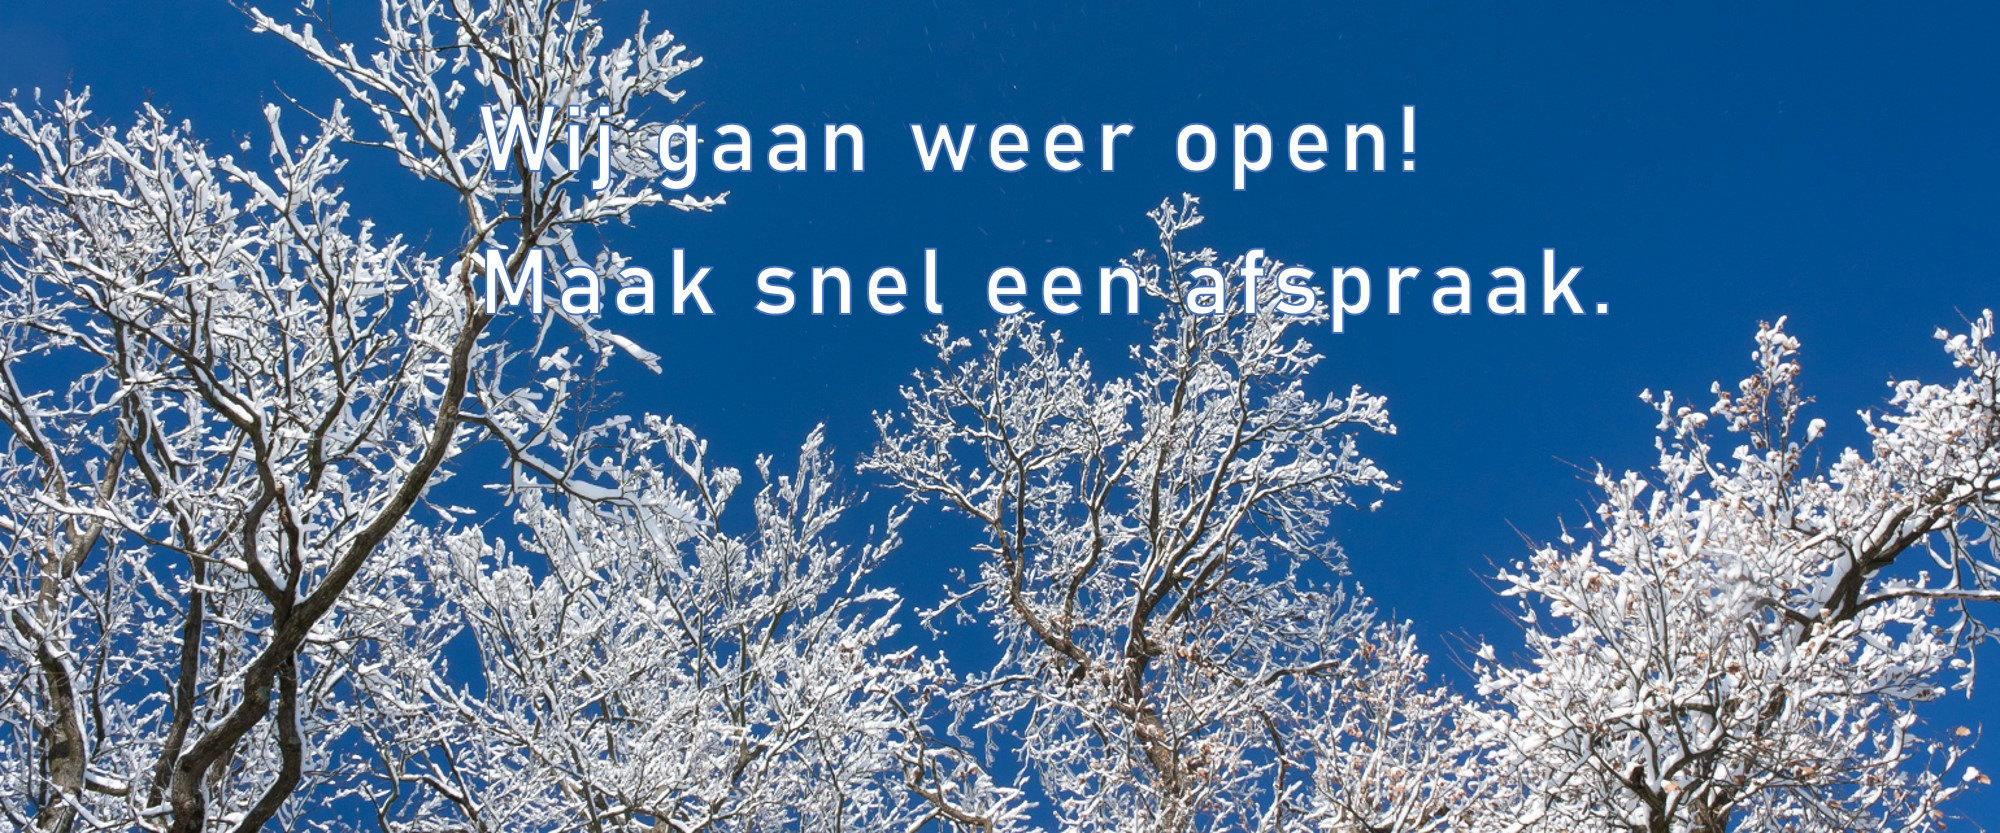 S_Winter_1327539_83173807_2_txt